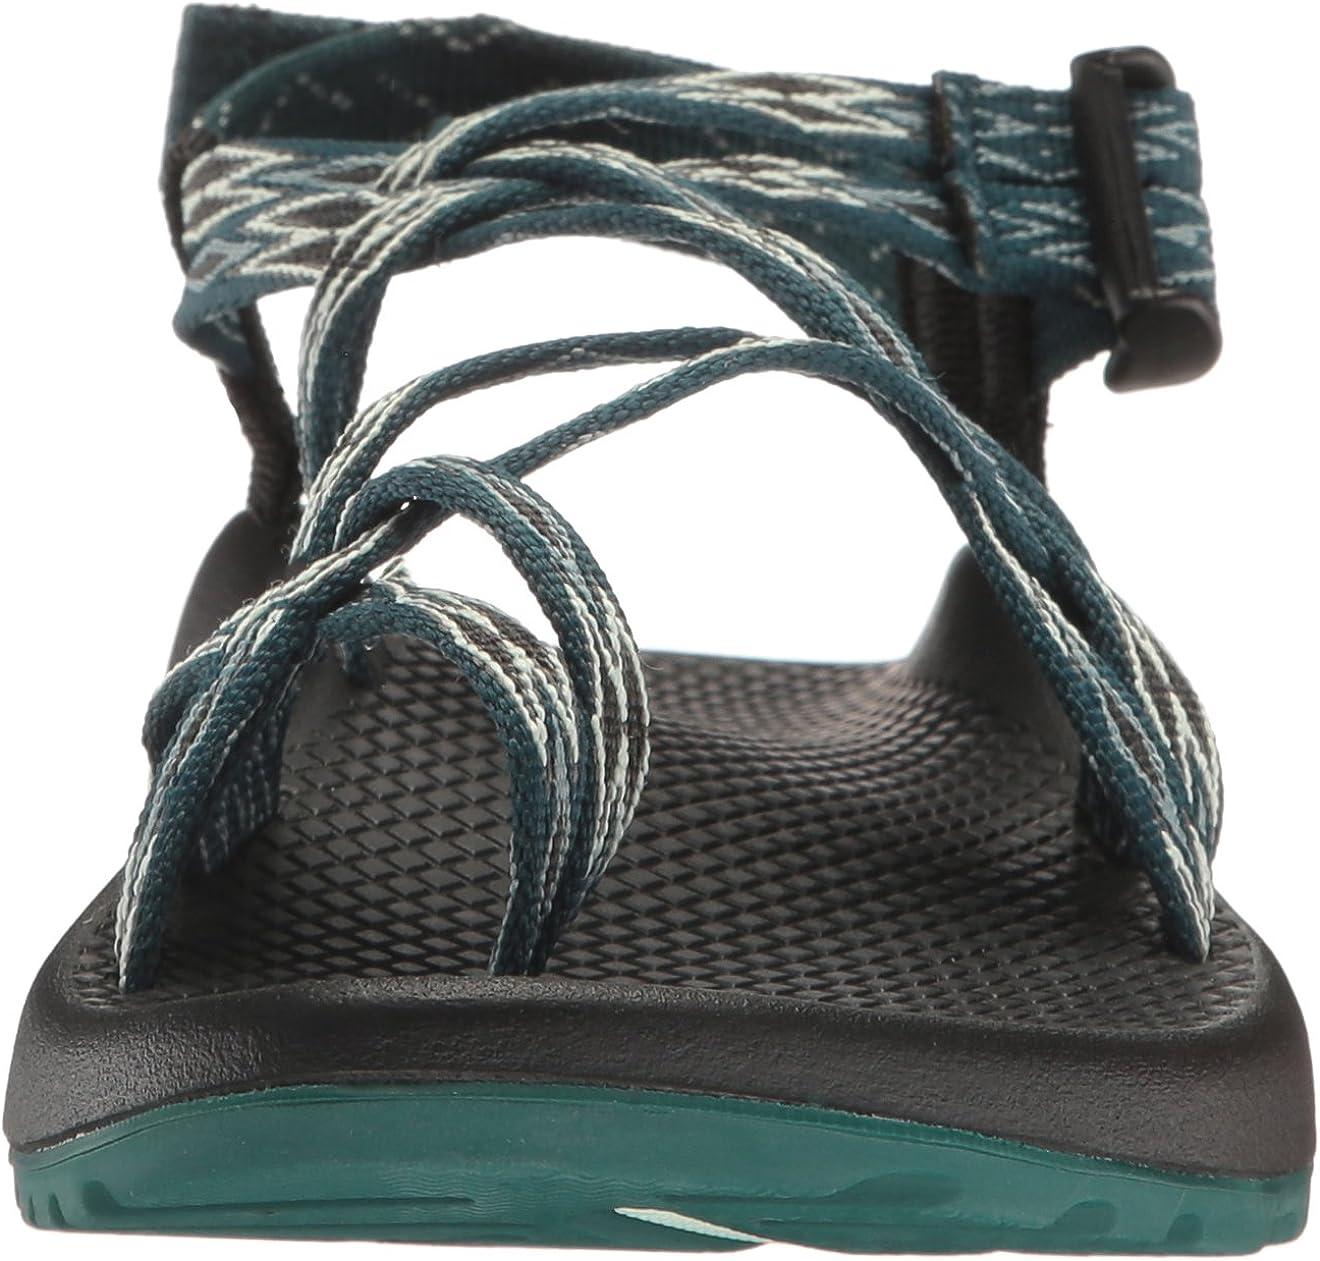 Chaco Zx2 Classic Athletic Sandalo da donna Angolare Teal